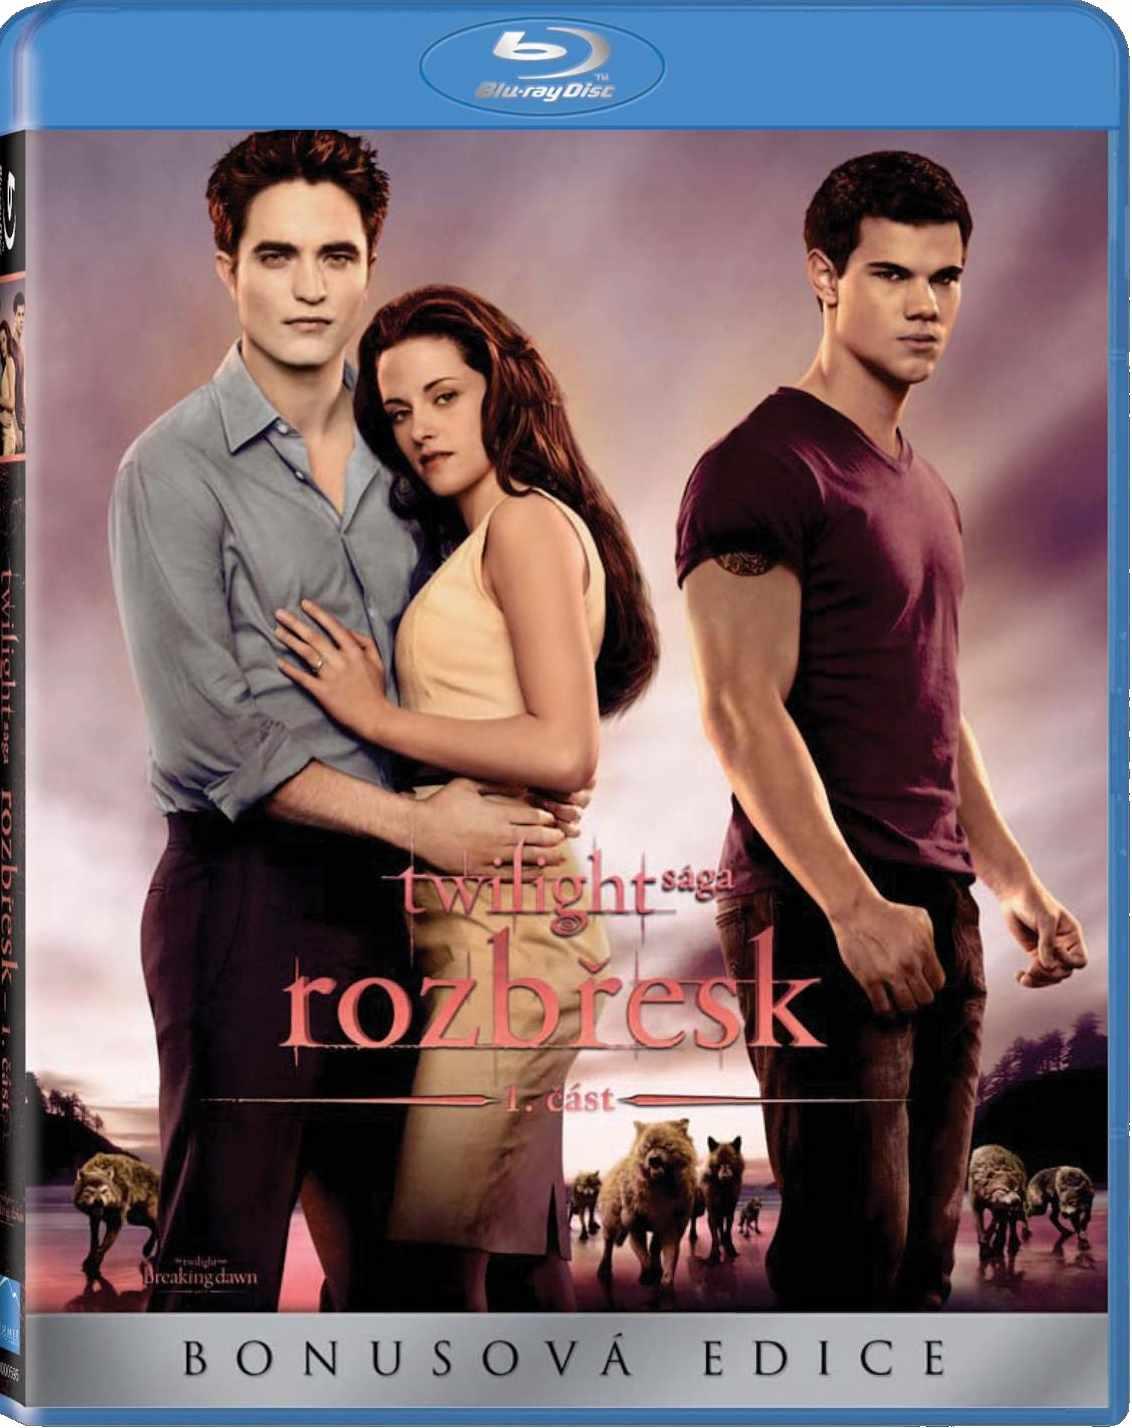 TWILIGHT SÁGA: ROZBŘESK - 1. ČÁST - Blu-ray